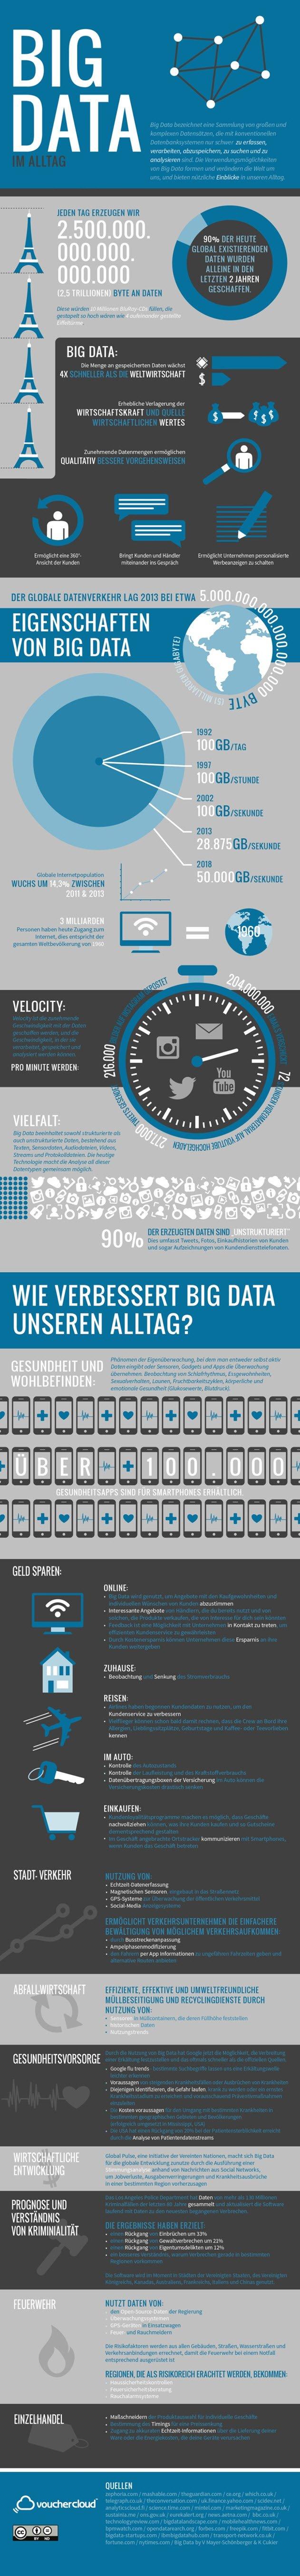 Big Data – die grosse Info-Grafik